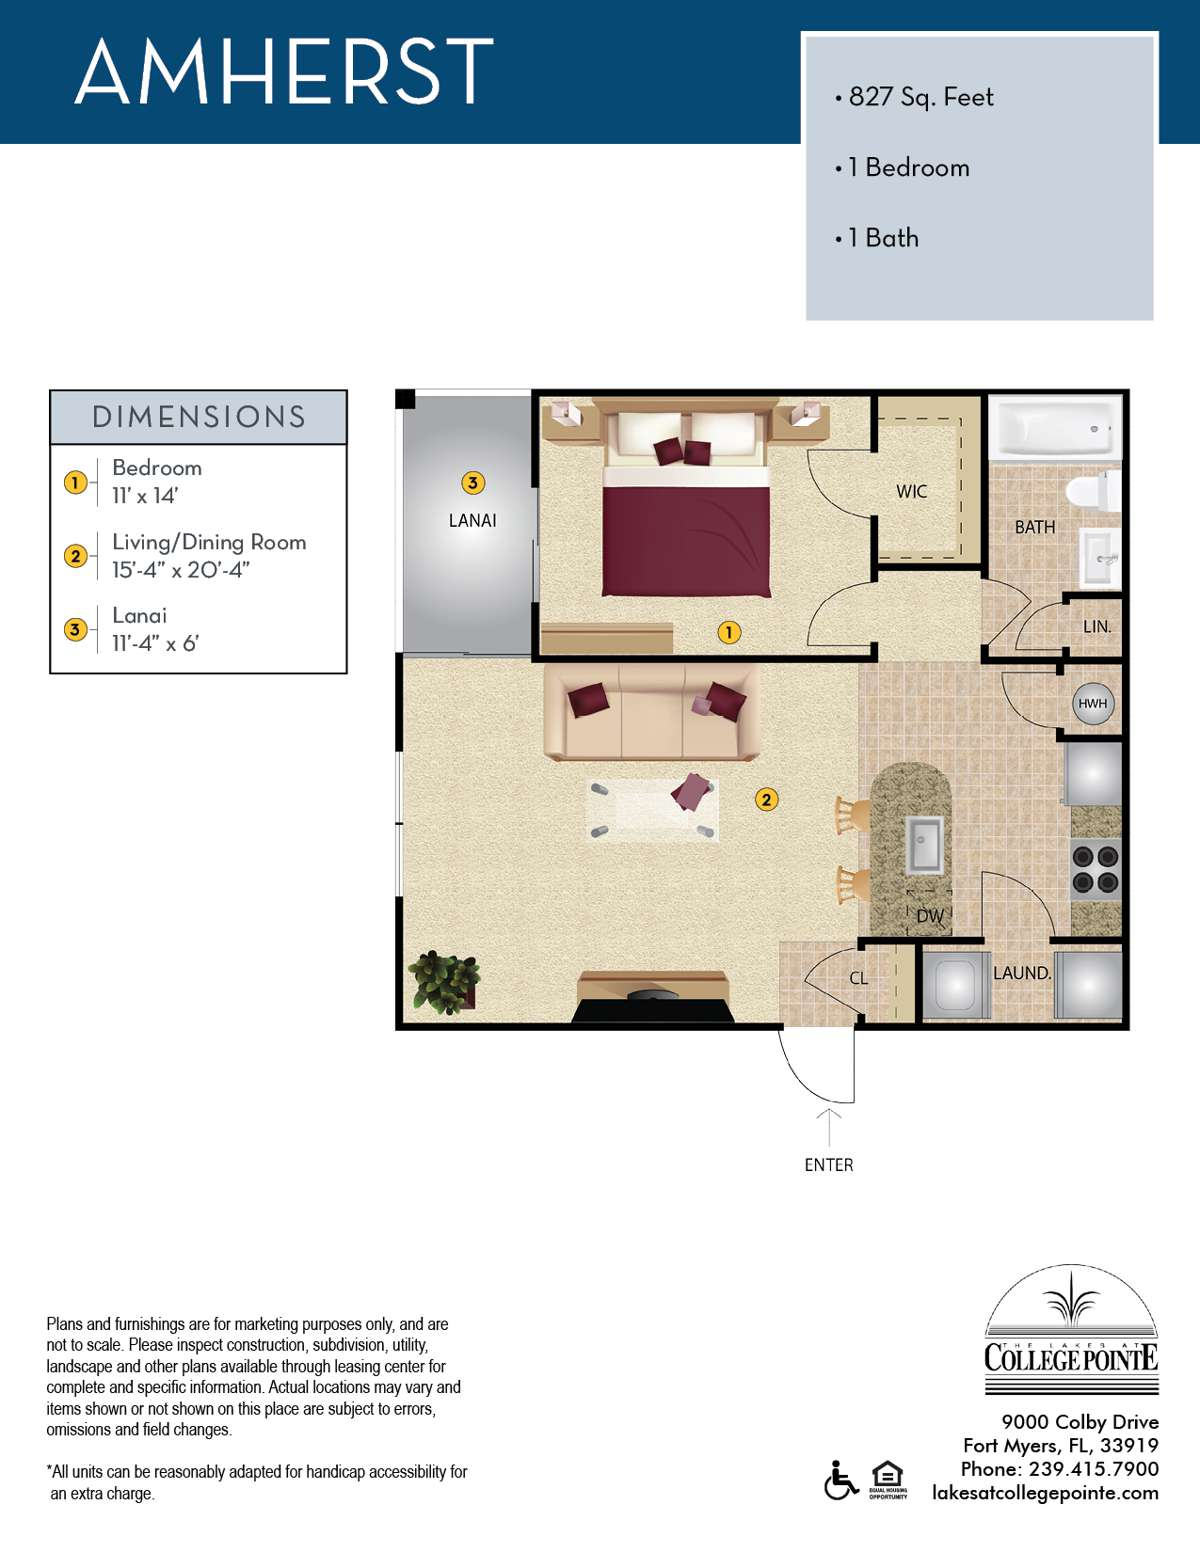 The Amherst Floor Plan